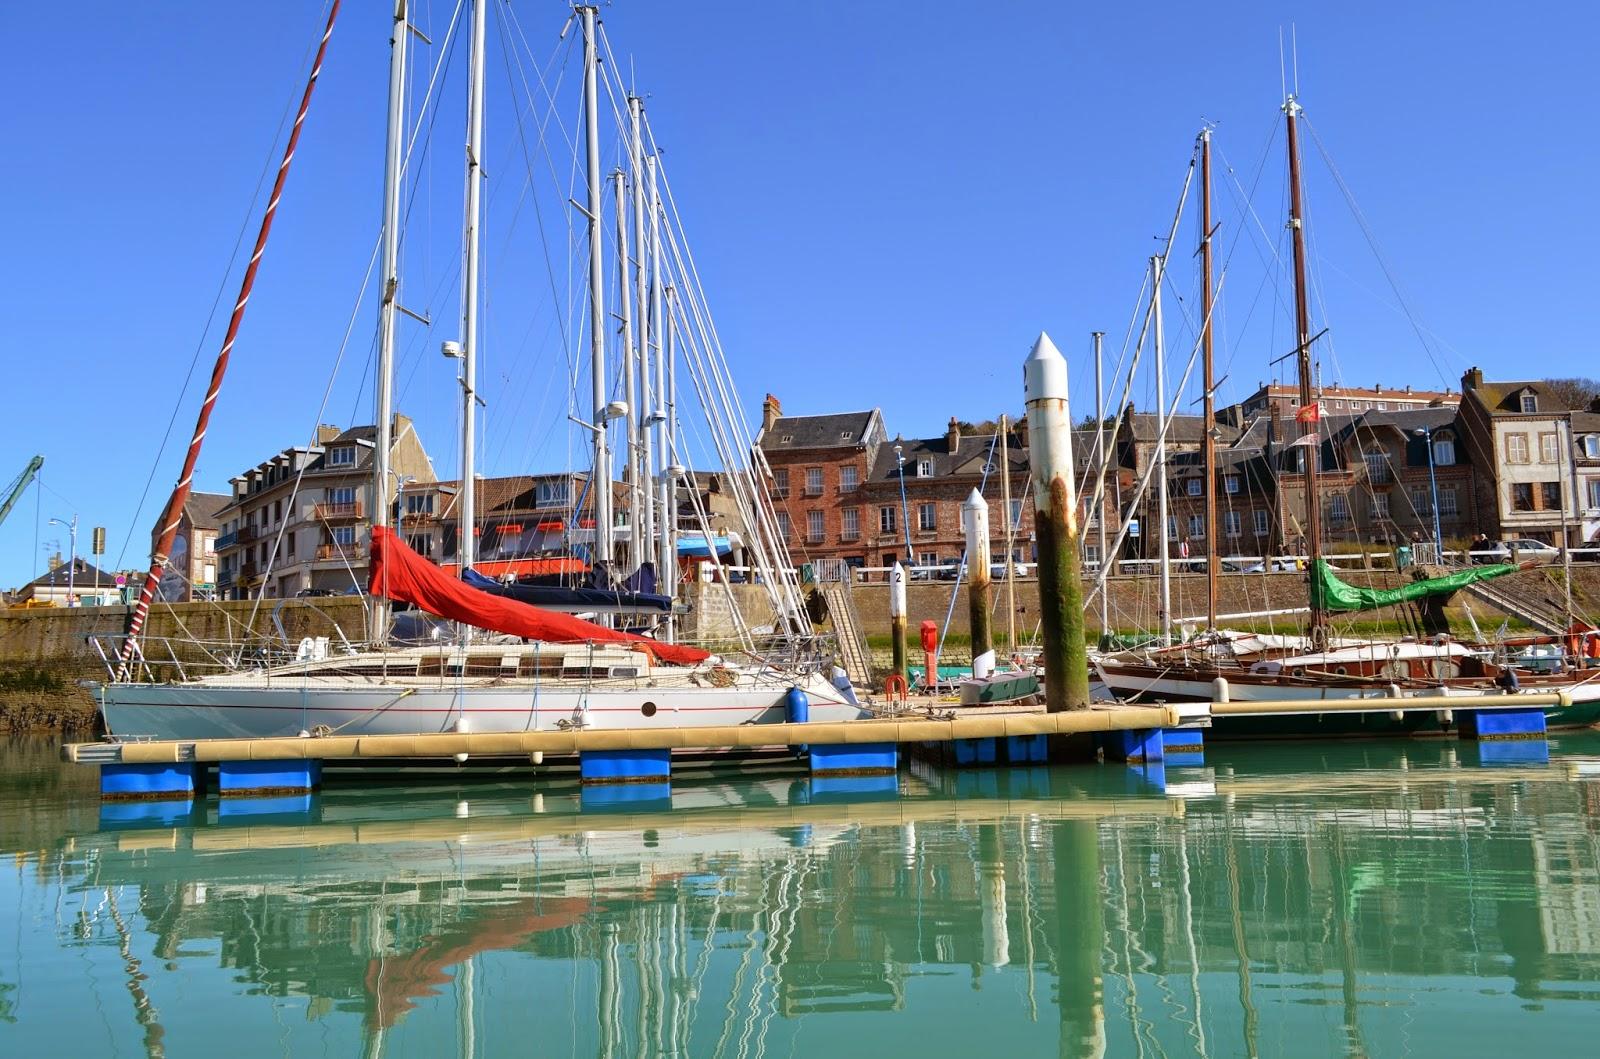 Les villages de la c te d 39 alb tre vus de la mer - Saint valery en caux restaurant du port ...